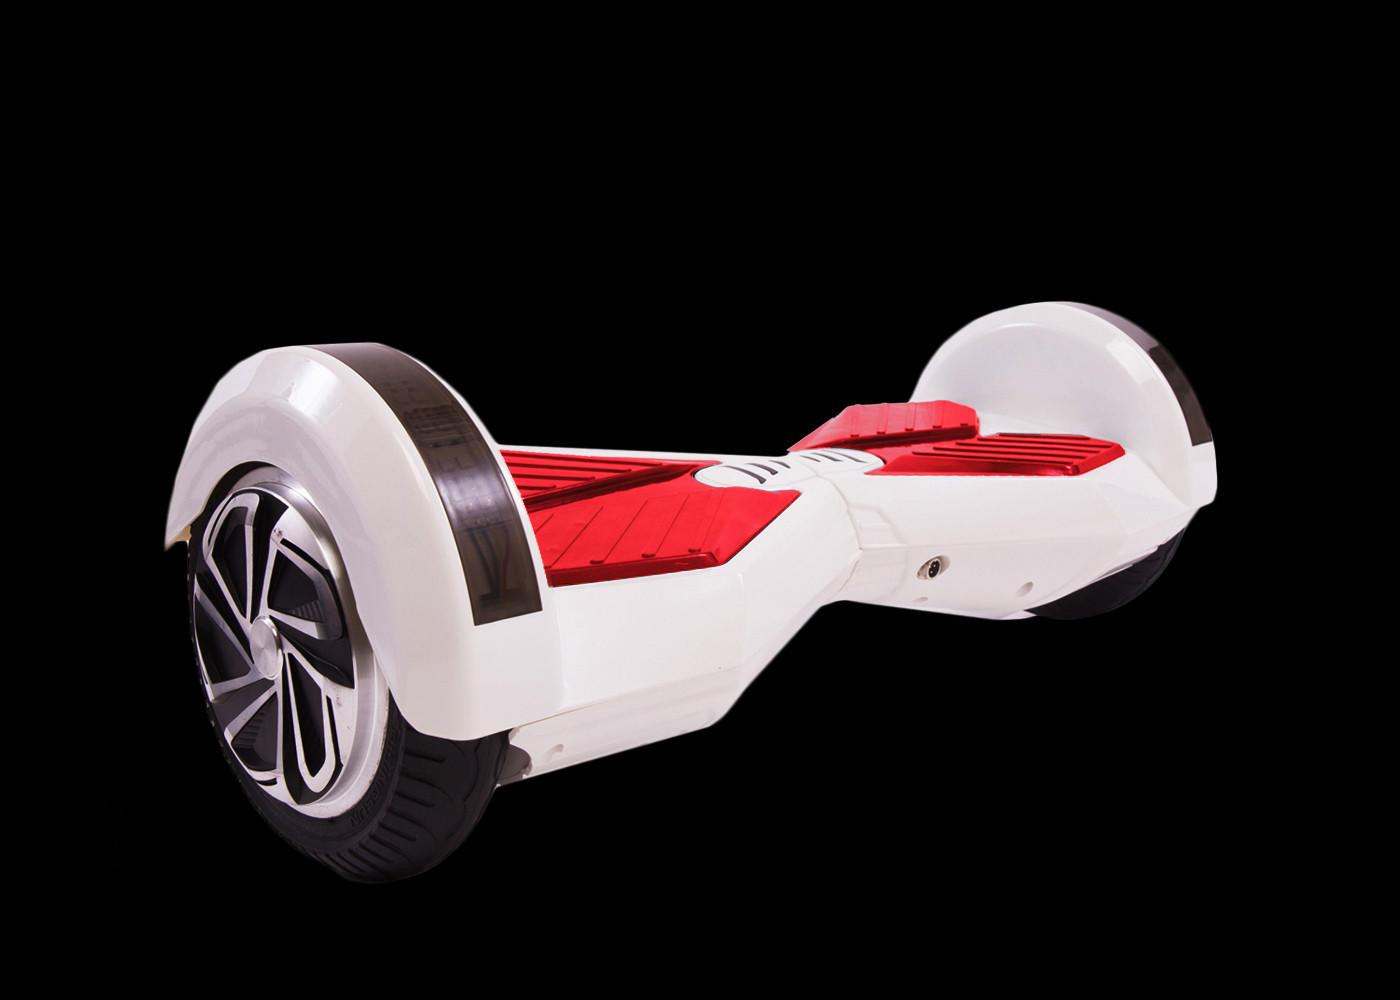 smart balance board with bluetooth white hover board nation. Black Bedroom Furniture Sets. Home Design Ideas